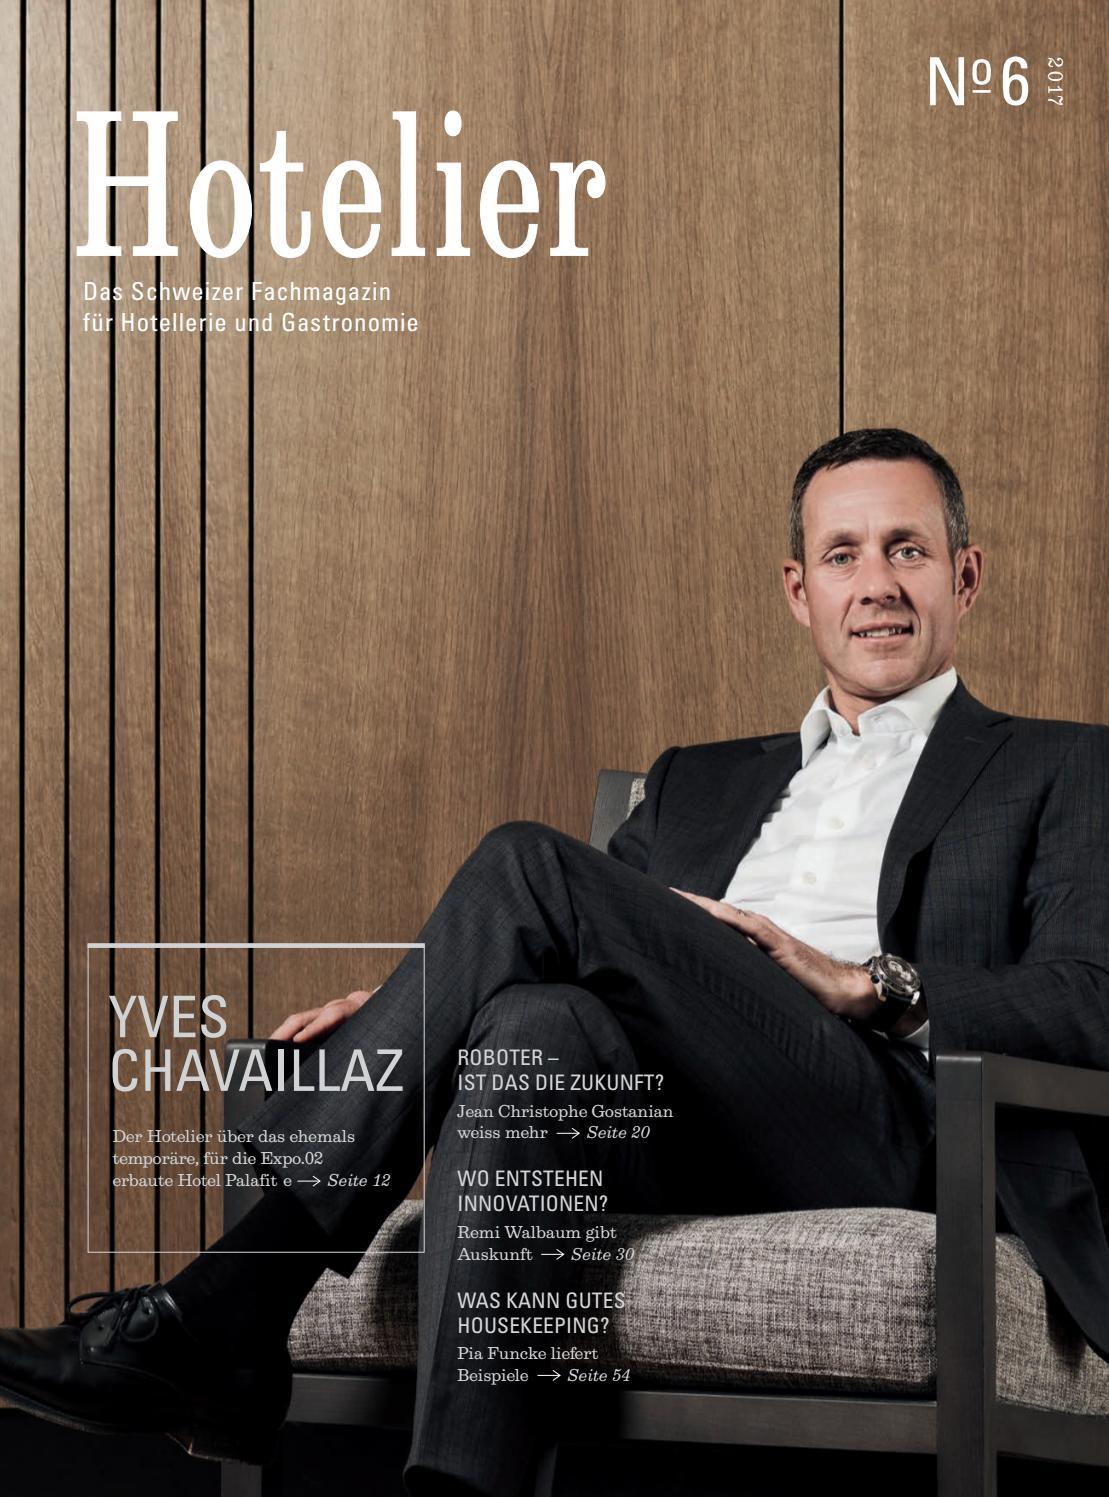 Hotelier 06 2017 by BL Verlag AG - issuu